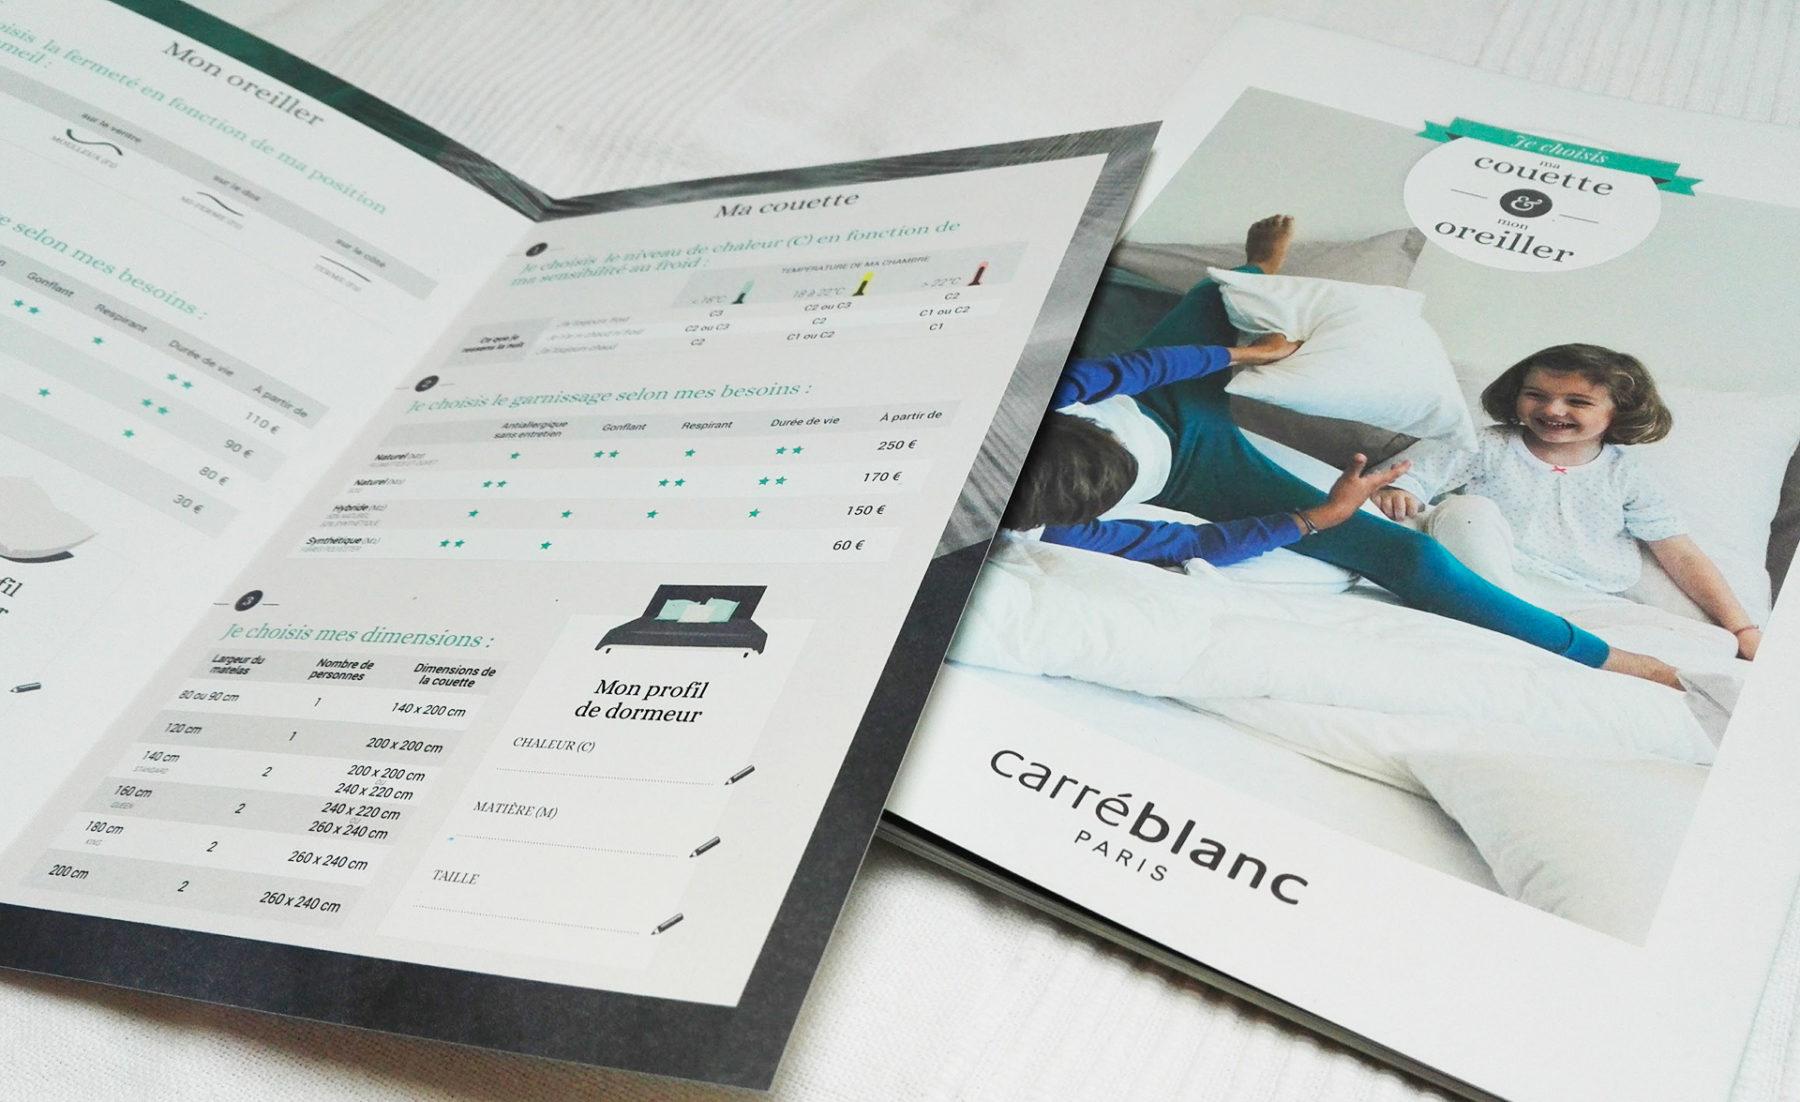 Carré blanc's flyer designed by MADMINT